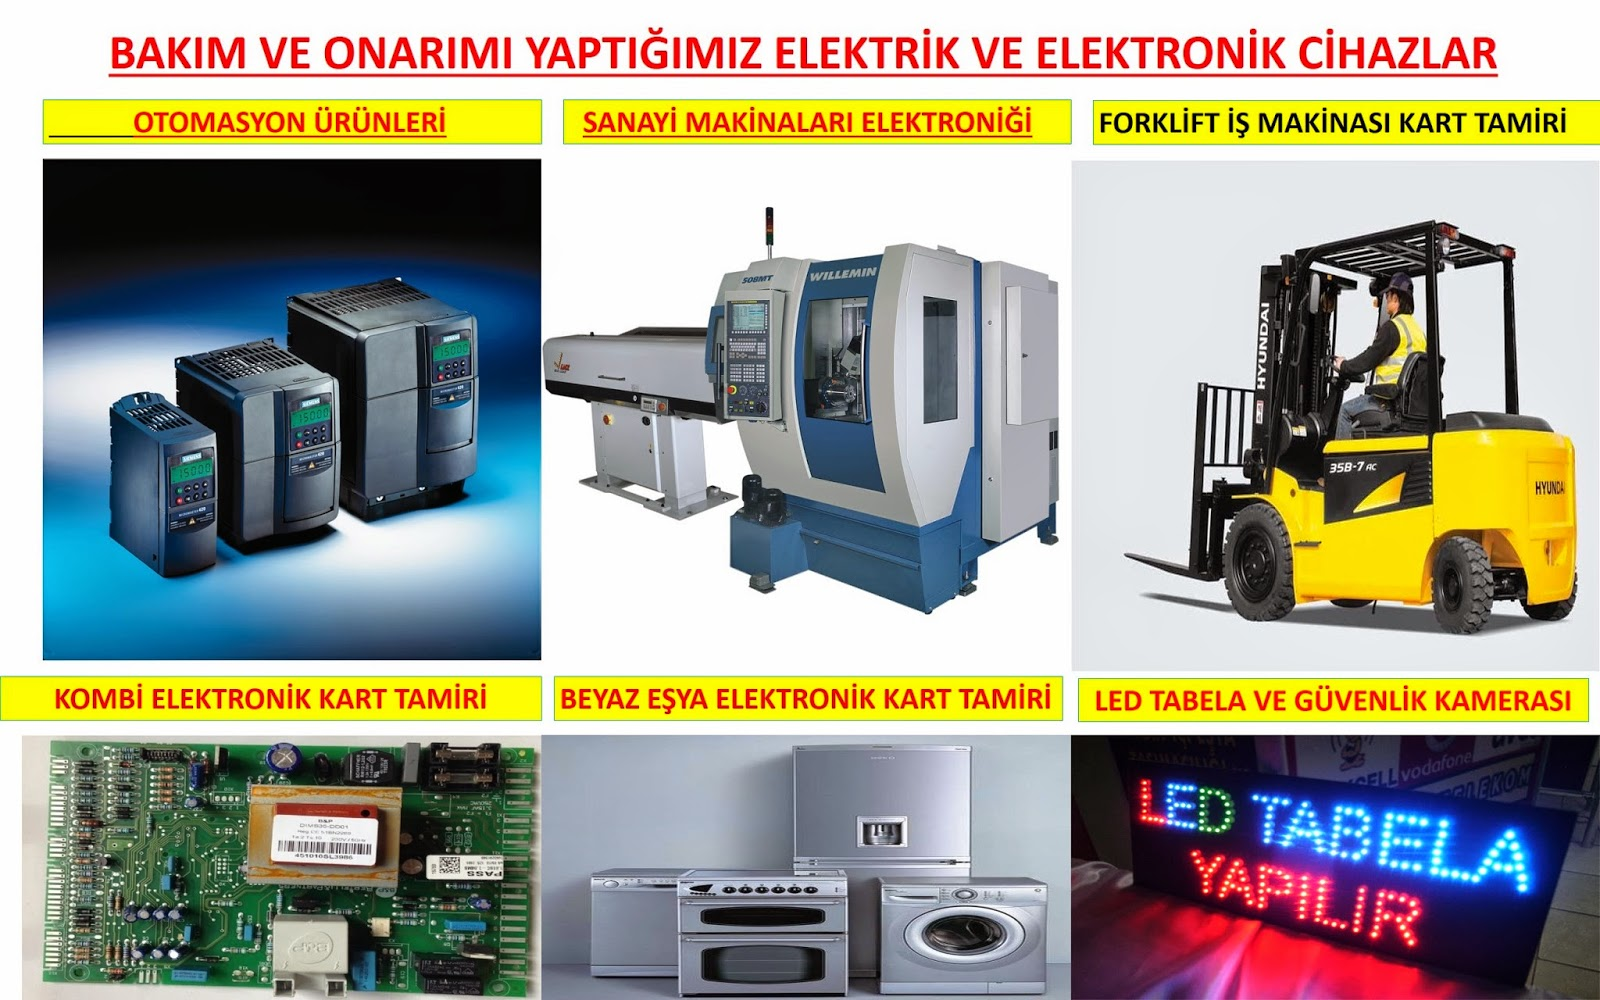 endüstriyel elektronik kart tamiri